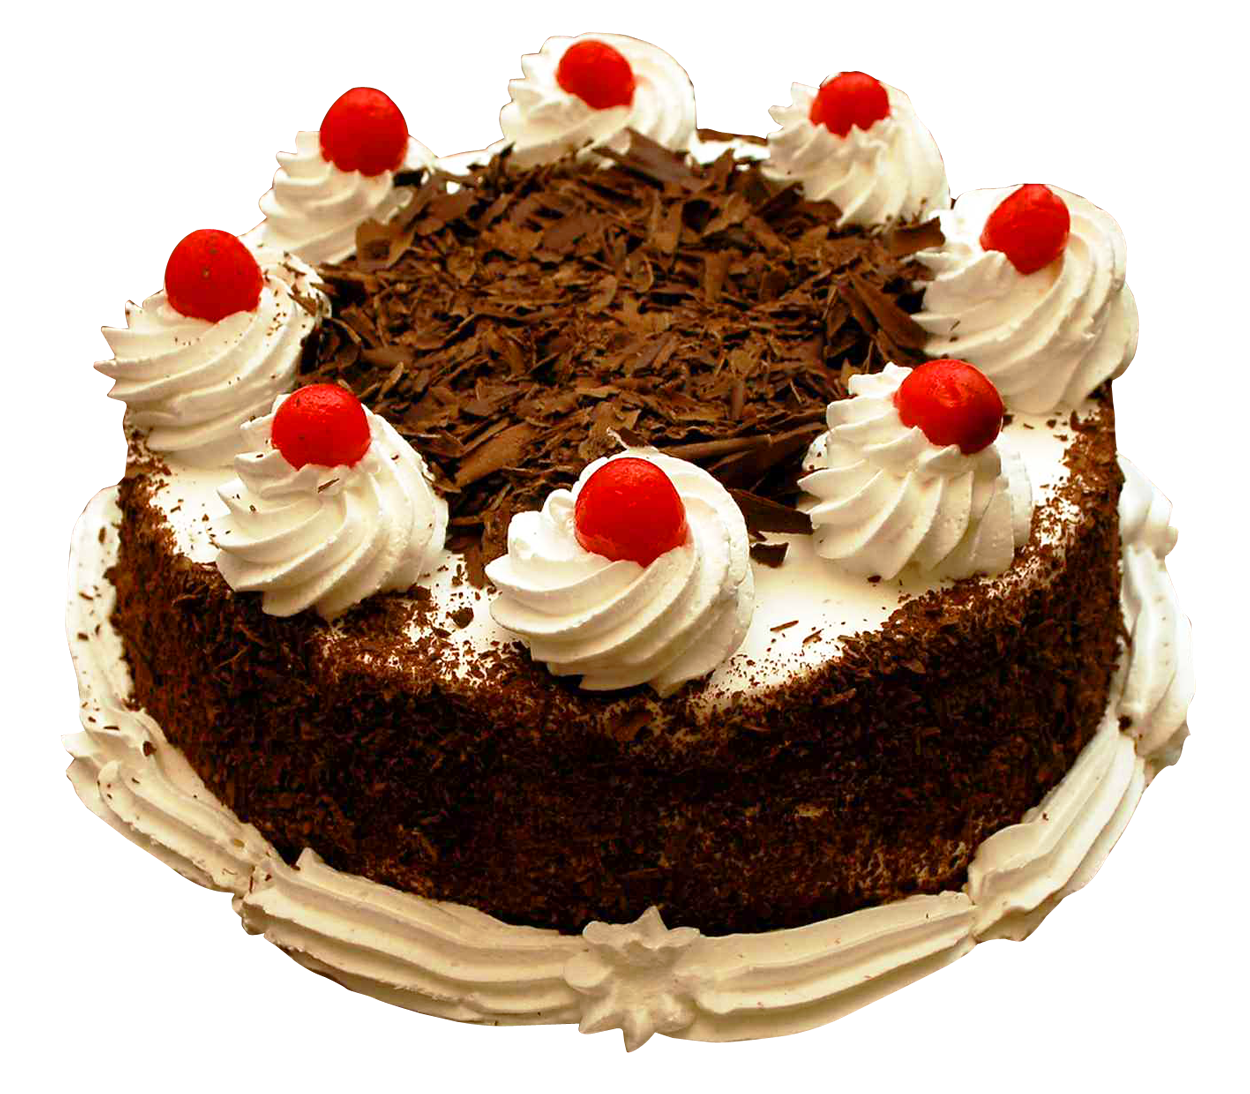 Pin by Charudeal on Cake Tasty chocolate cake, Cake